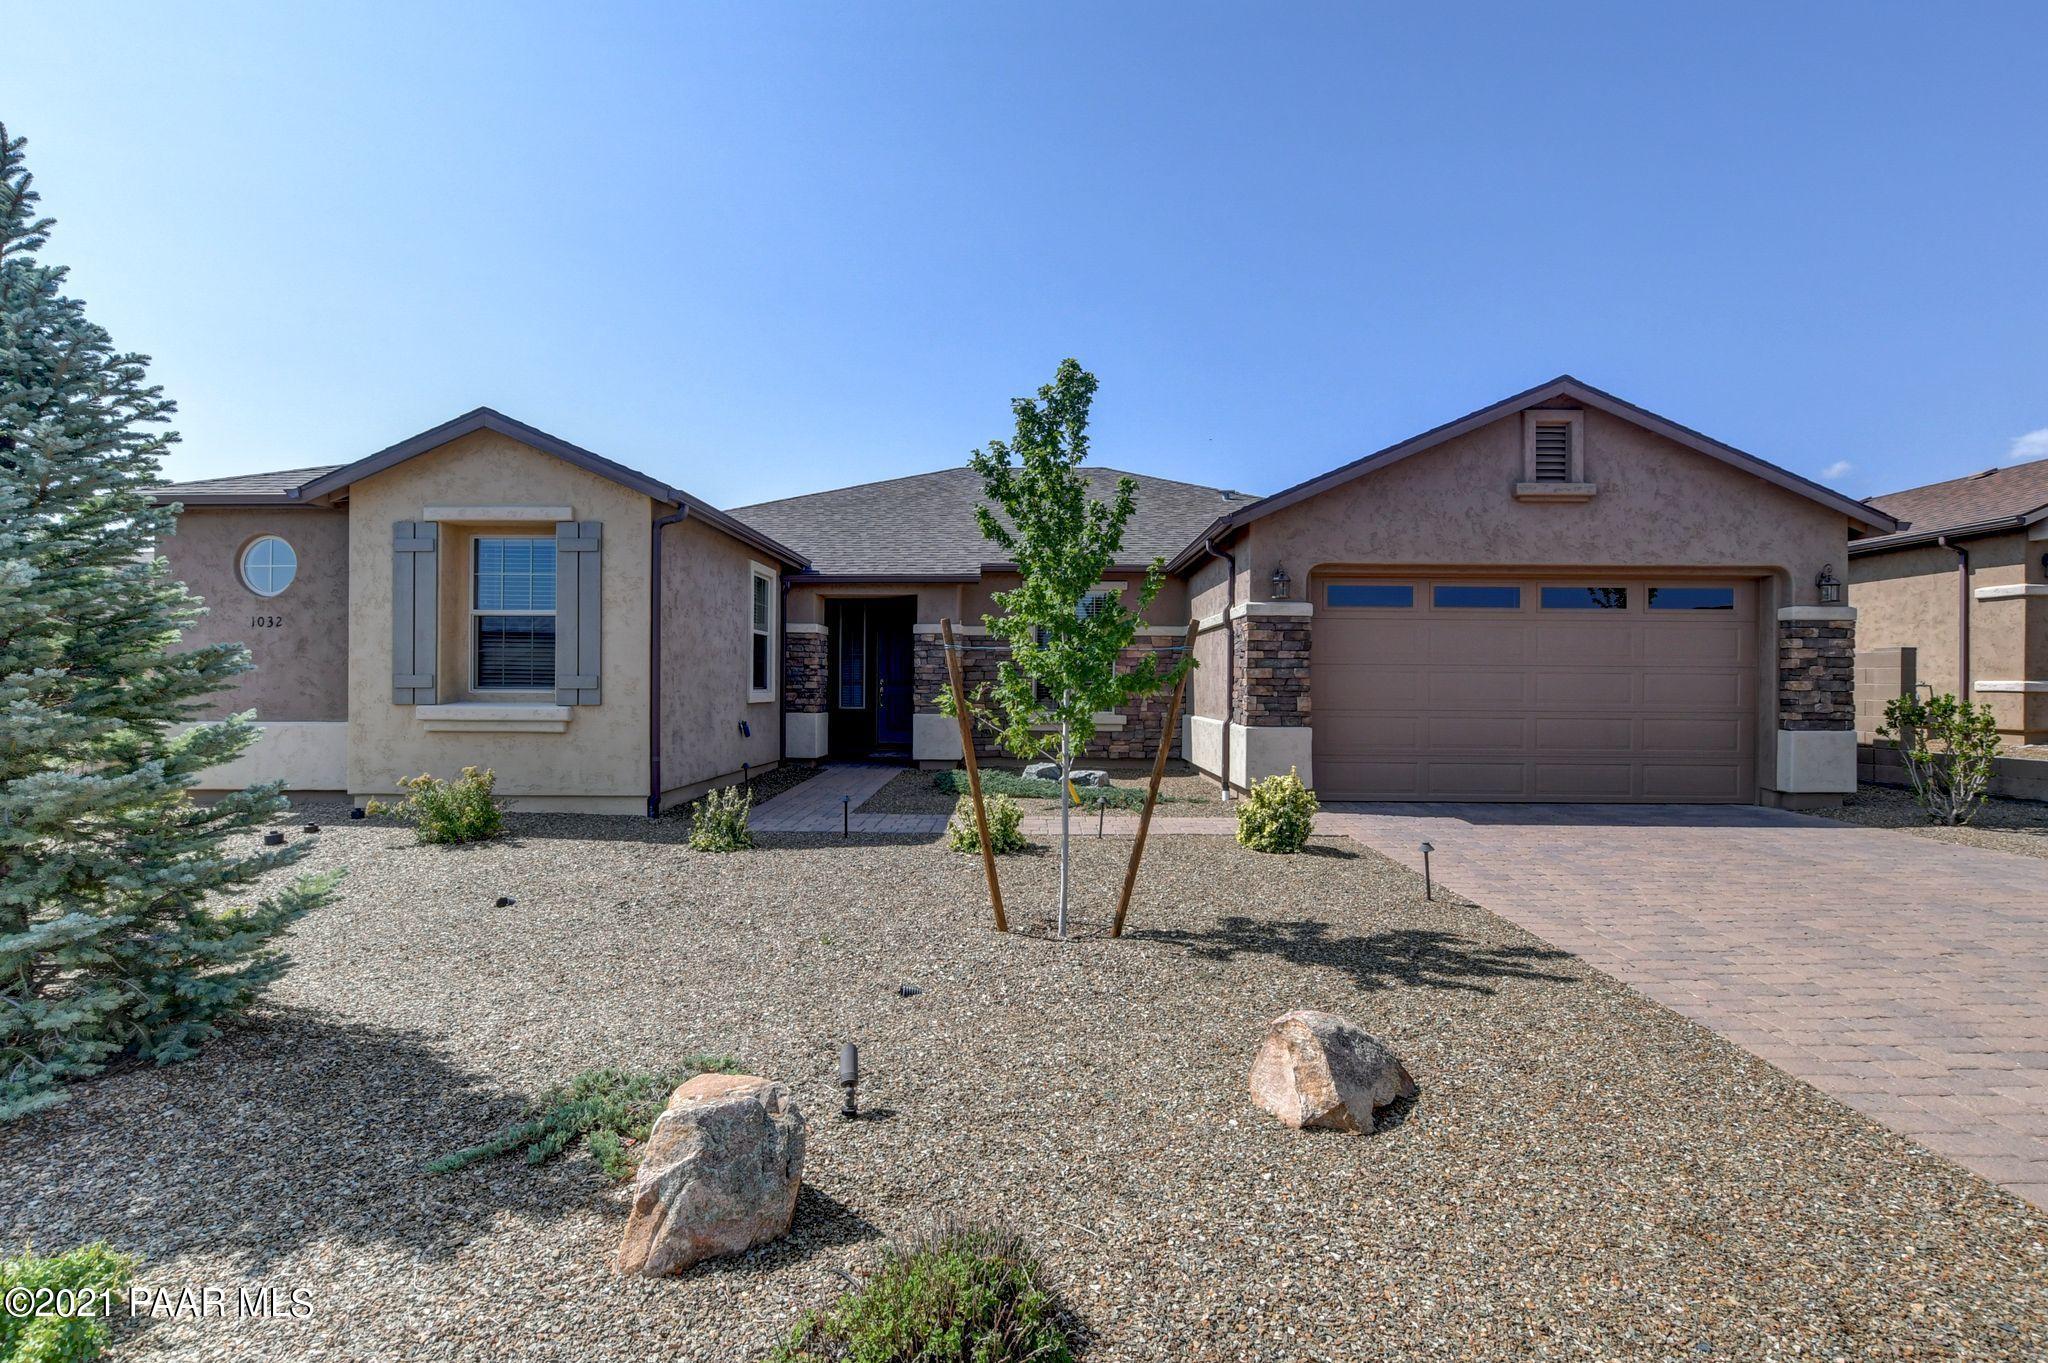 Photo of 1032 Wide Open, Prescott Valley, AZ 86314